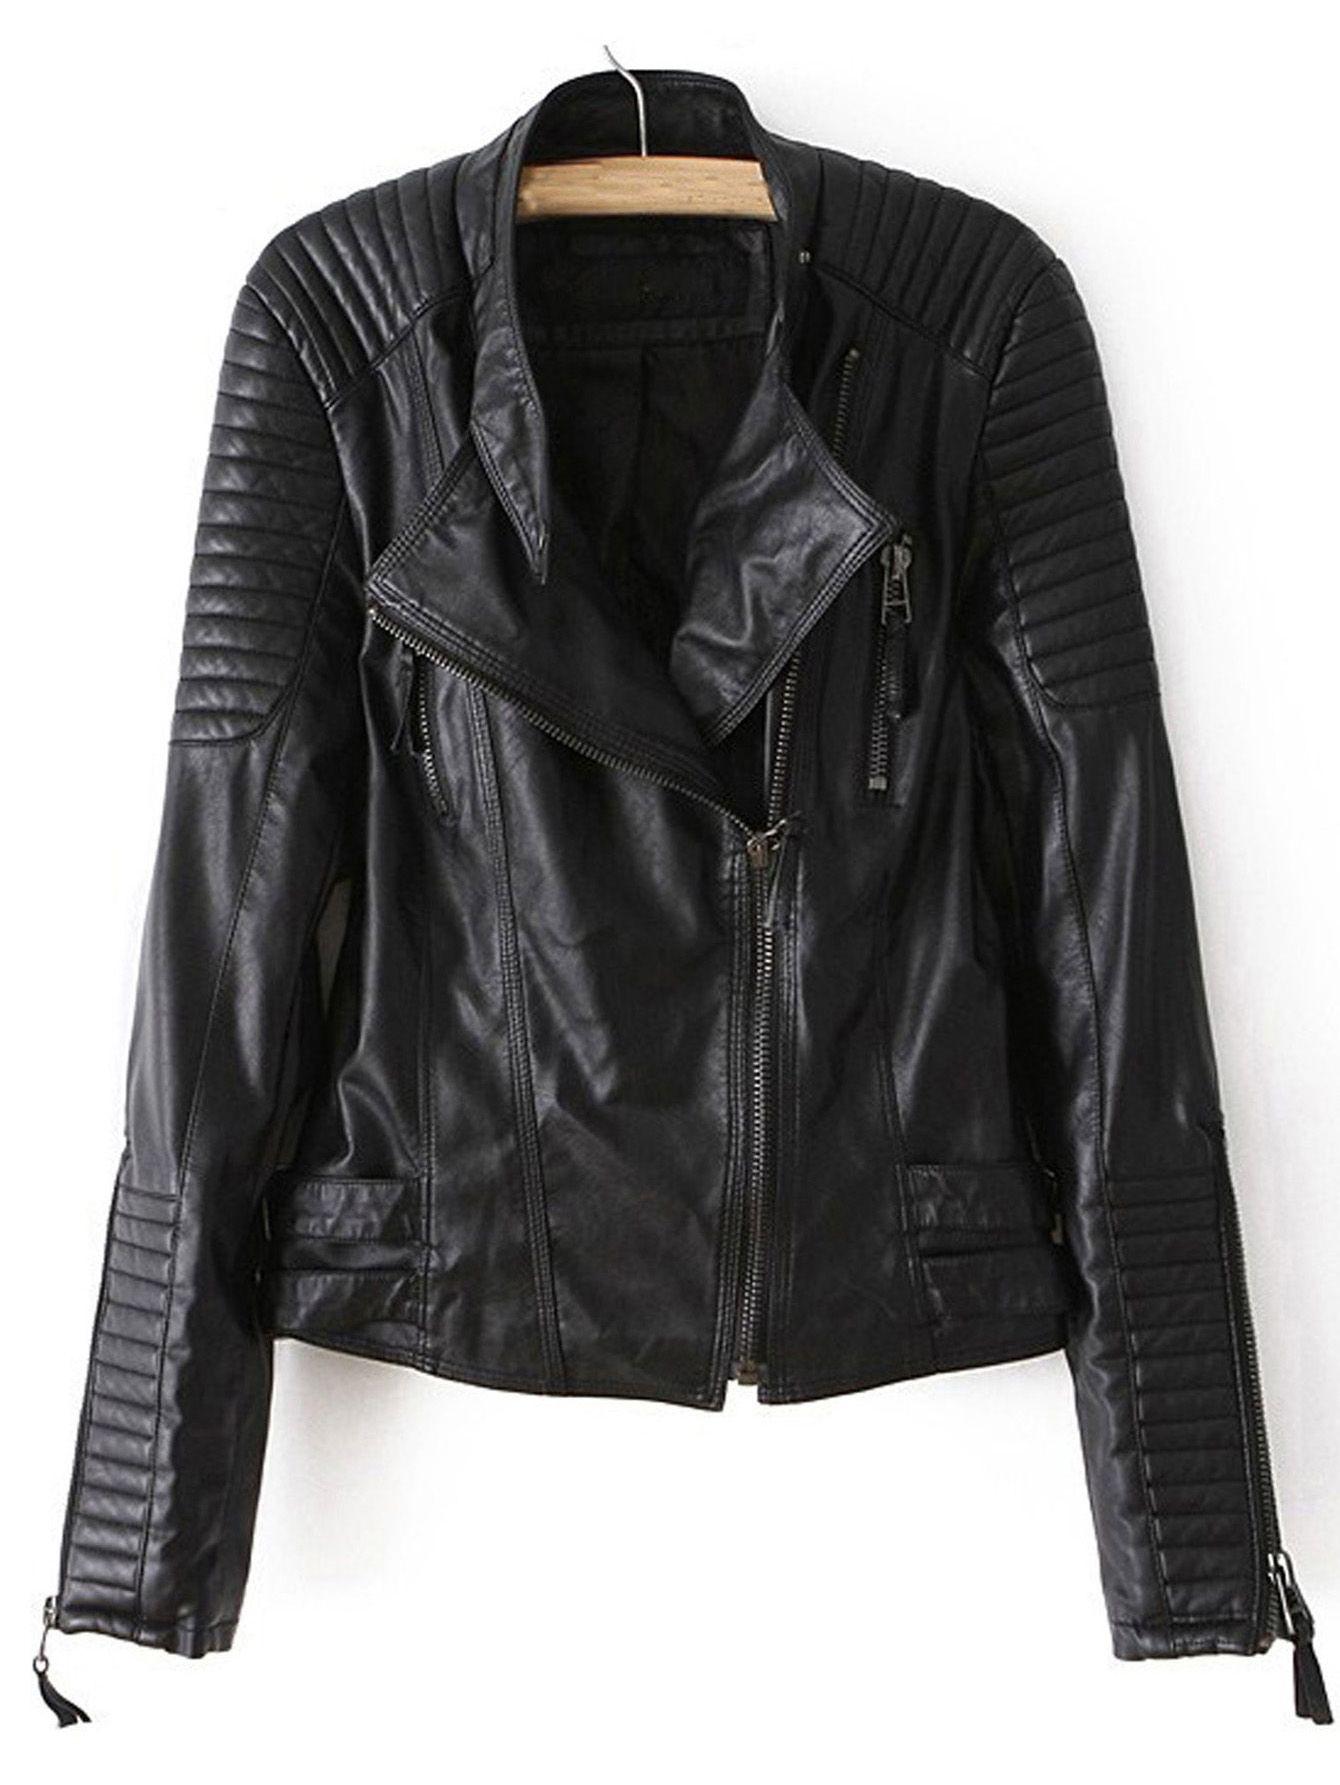 Shop Black Long Sleeve Zipper PU Leather Jacket online